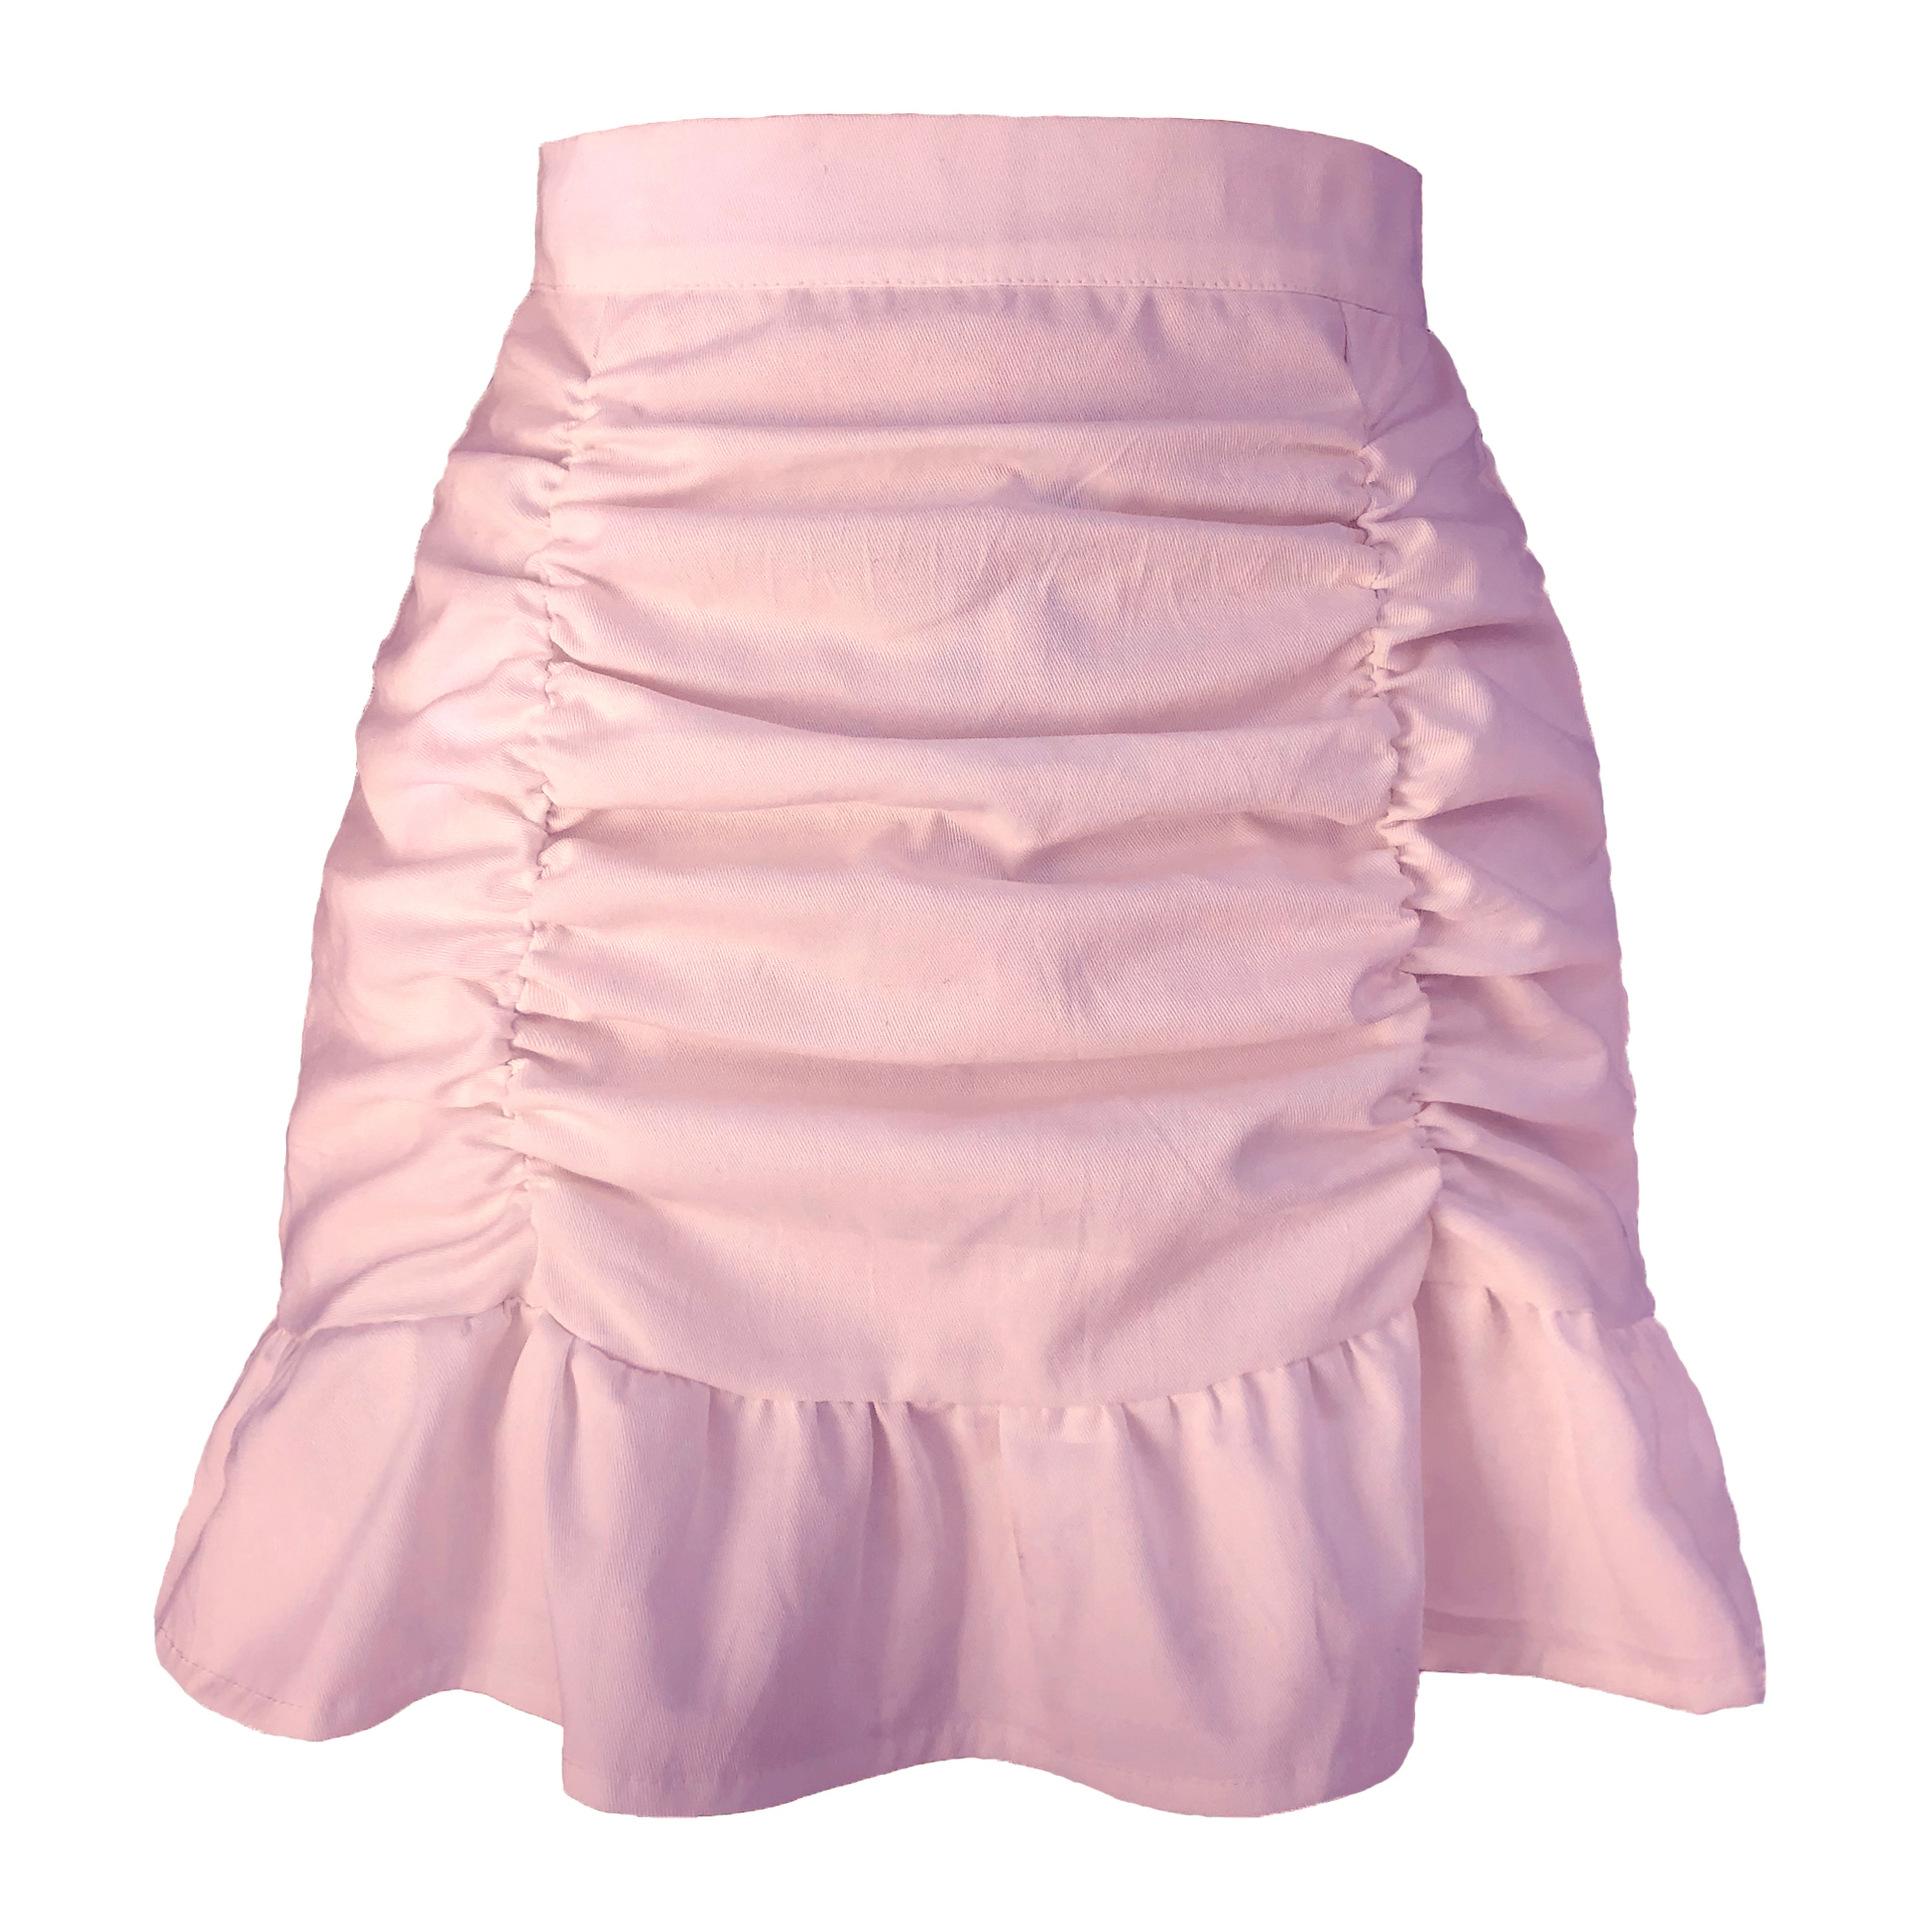 3D原图粉色